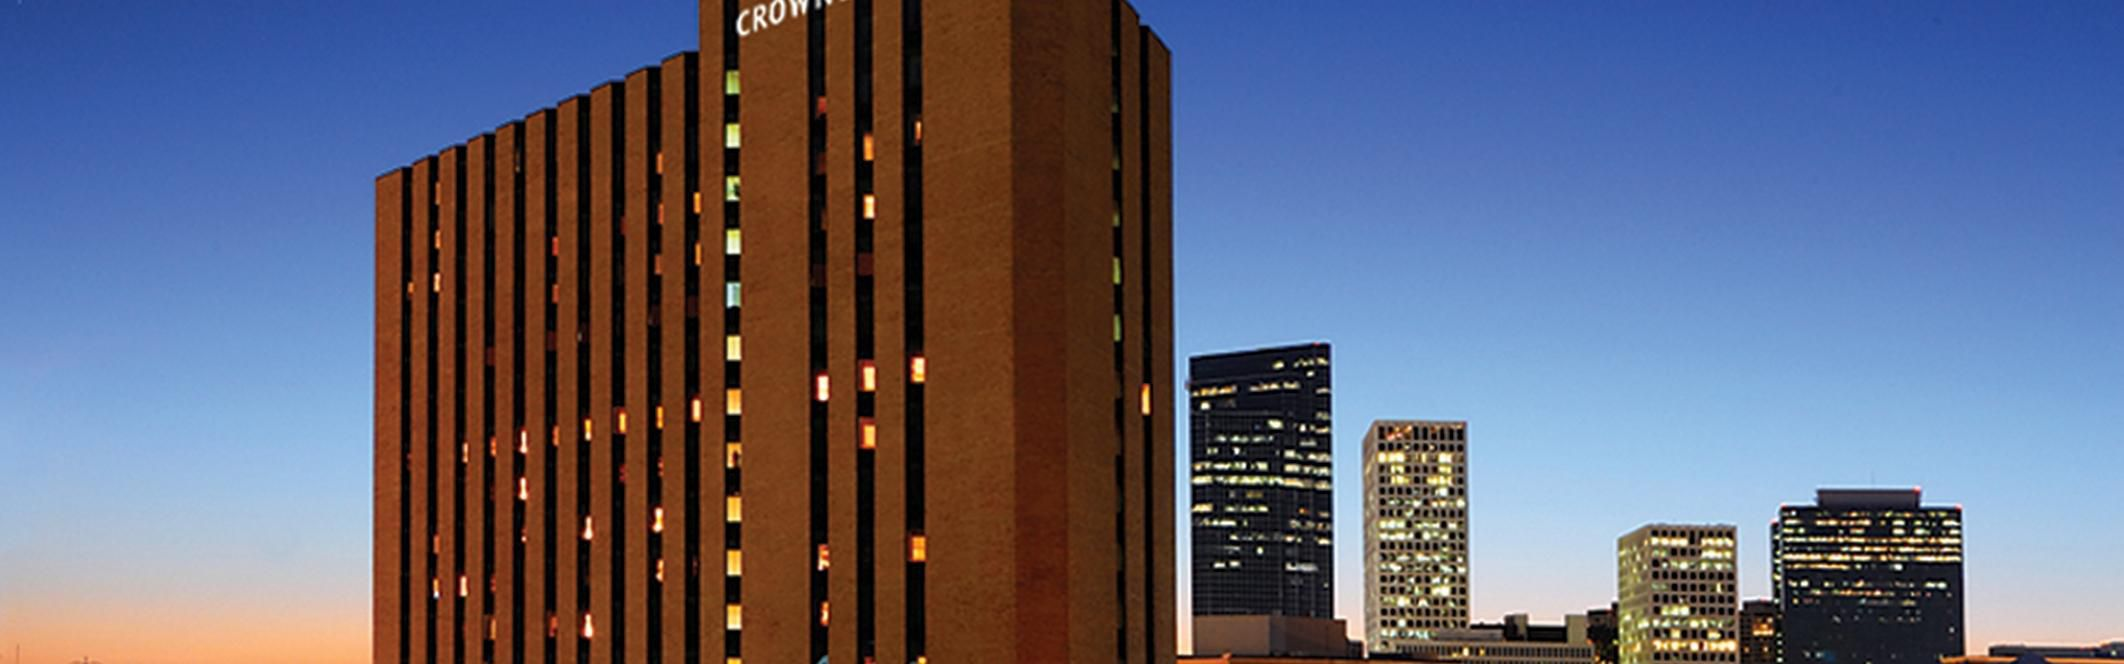 Crowne Plaza Houston River Oaks image 0